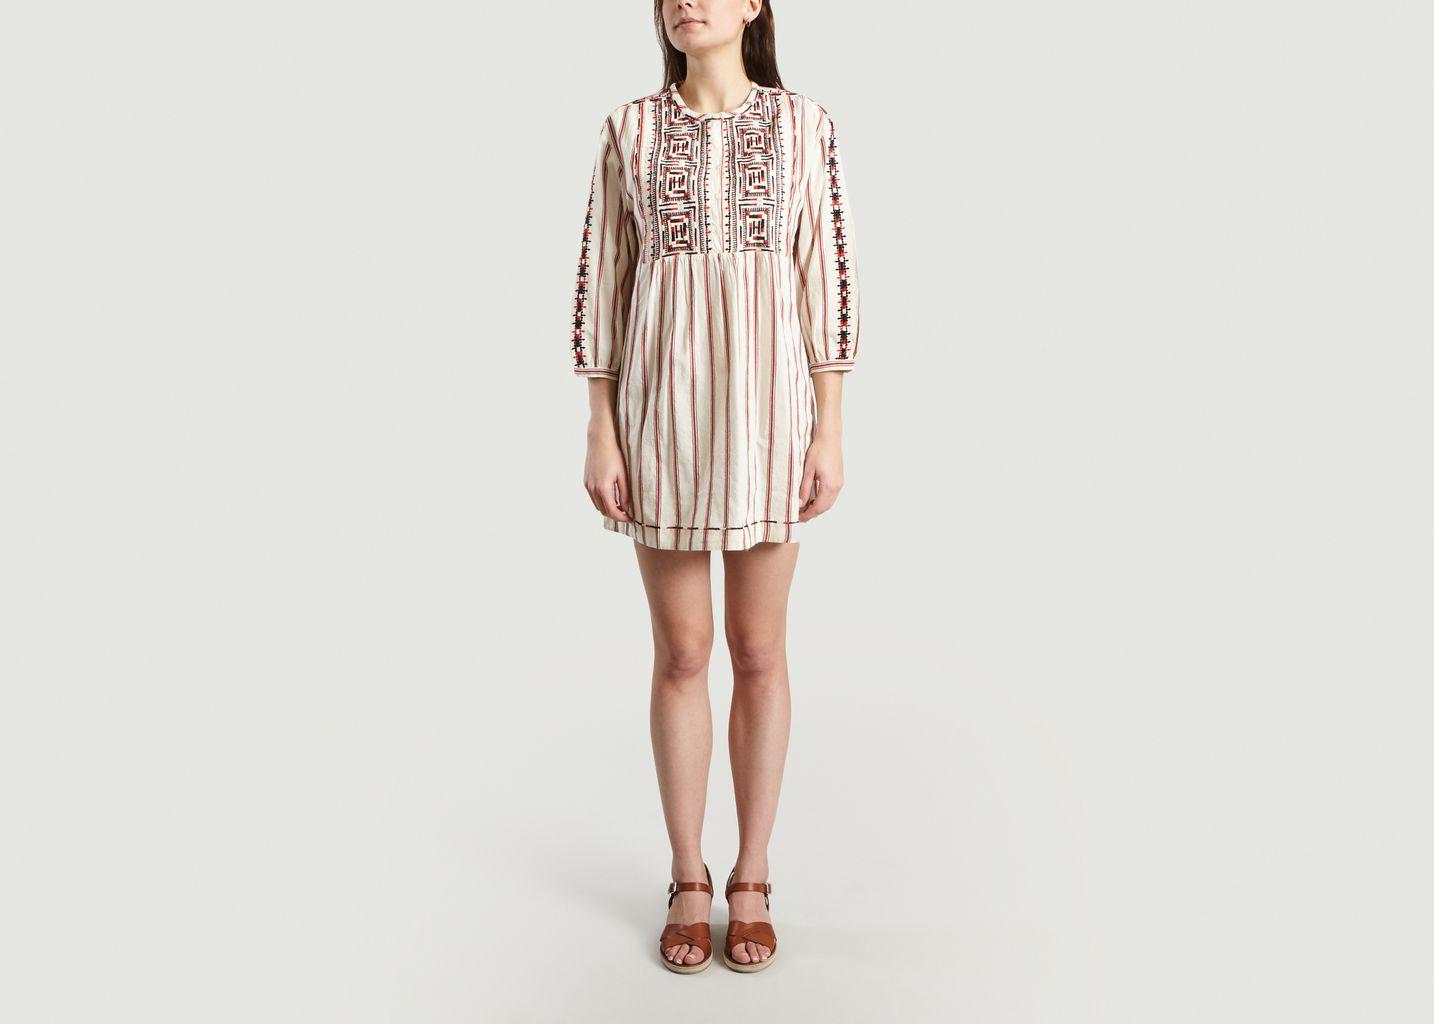 Robe Brodée Rosa - Ba&sh